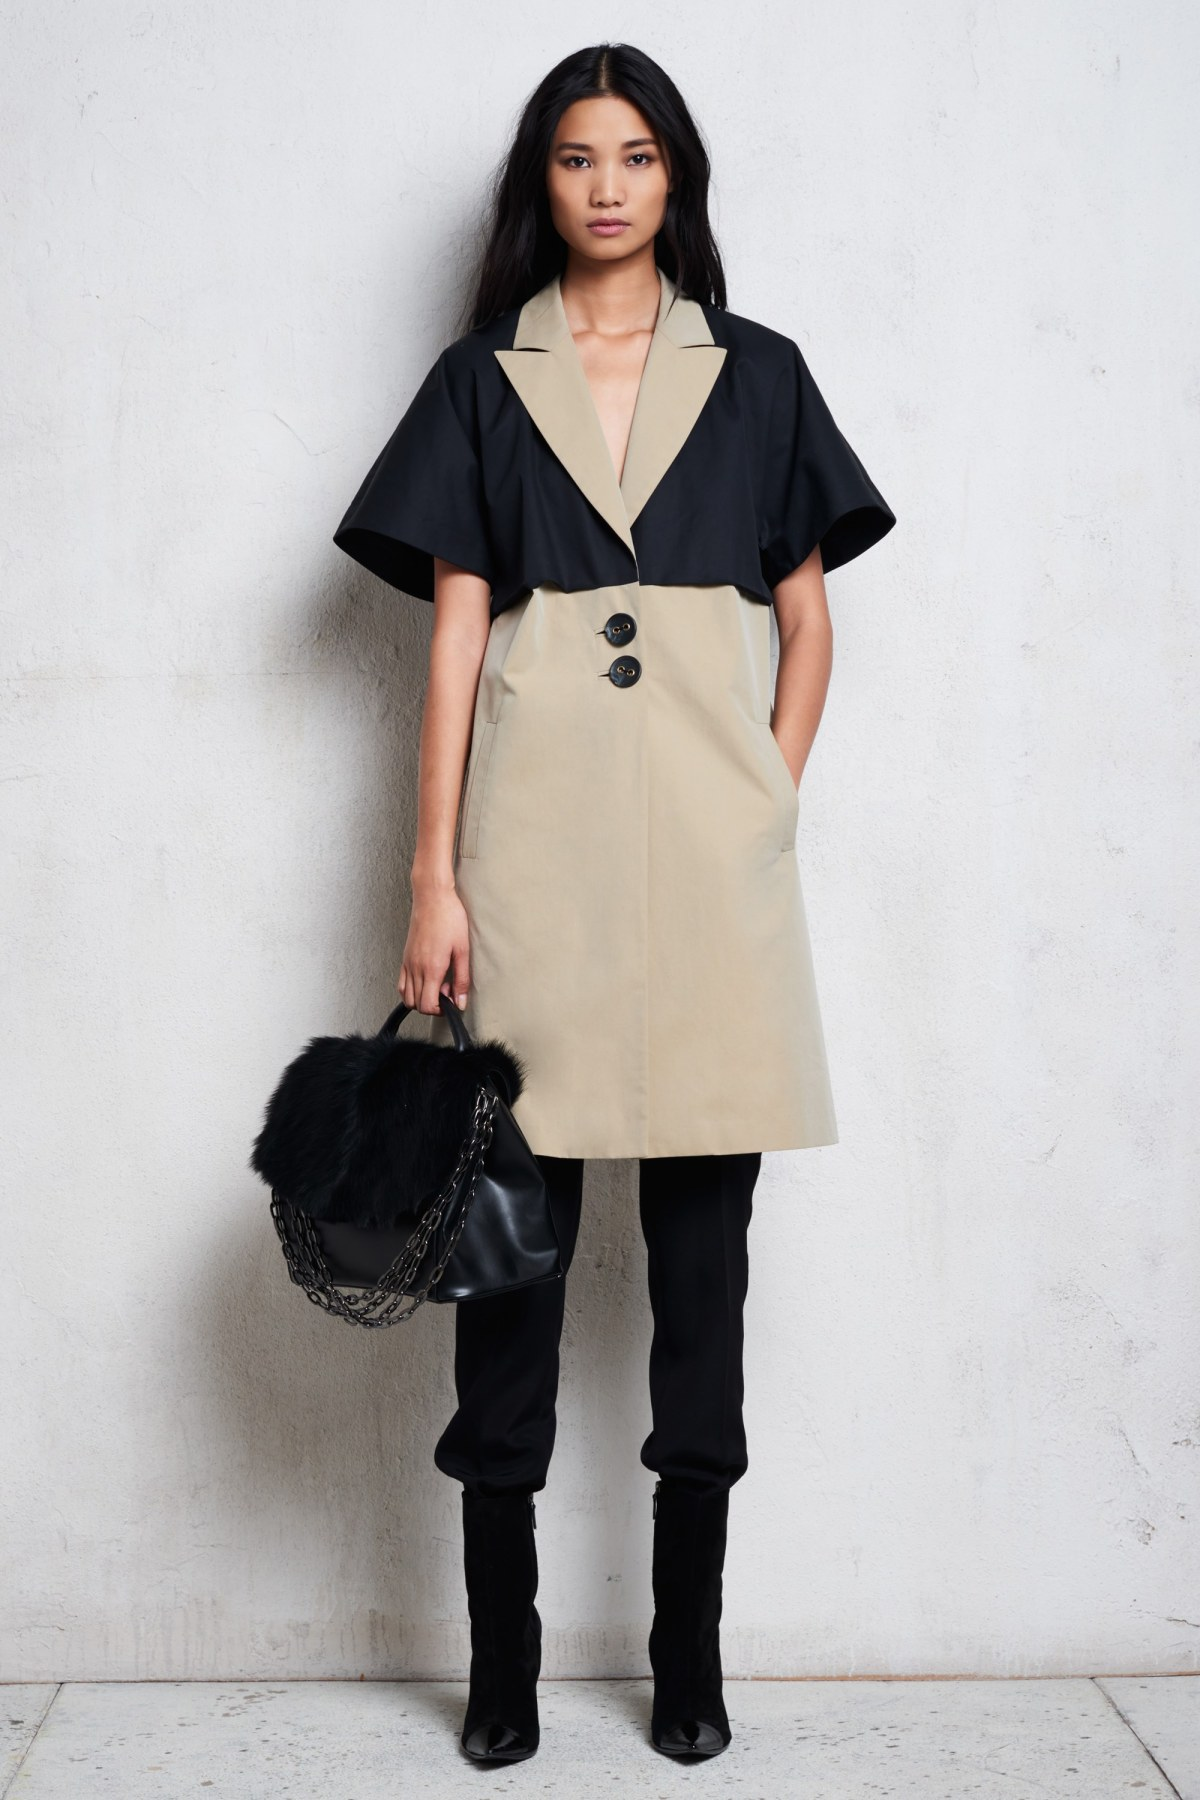 kimora-lee-simmons-pre-fall-2017-fashion-show-the-impression-21